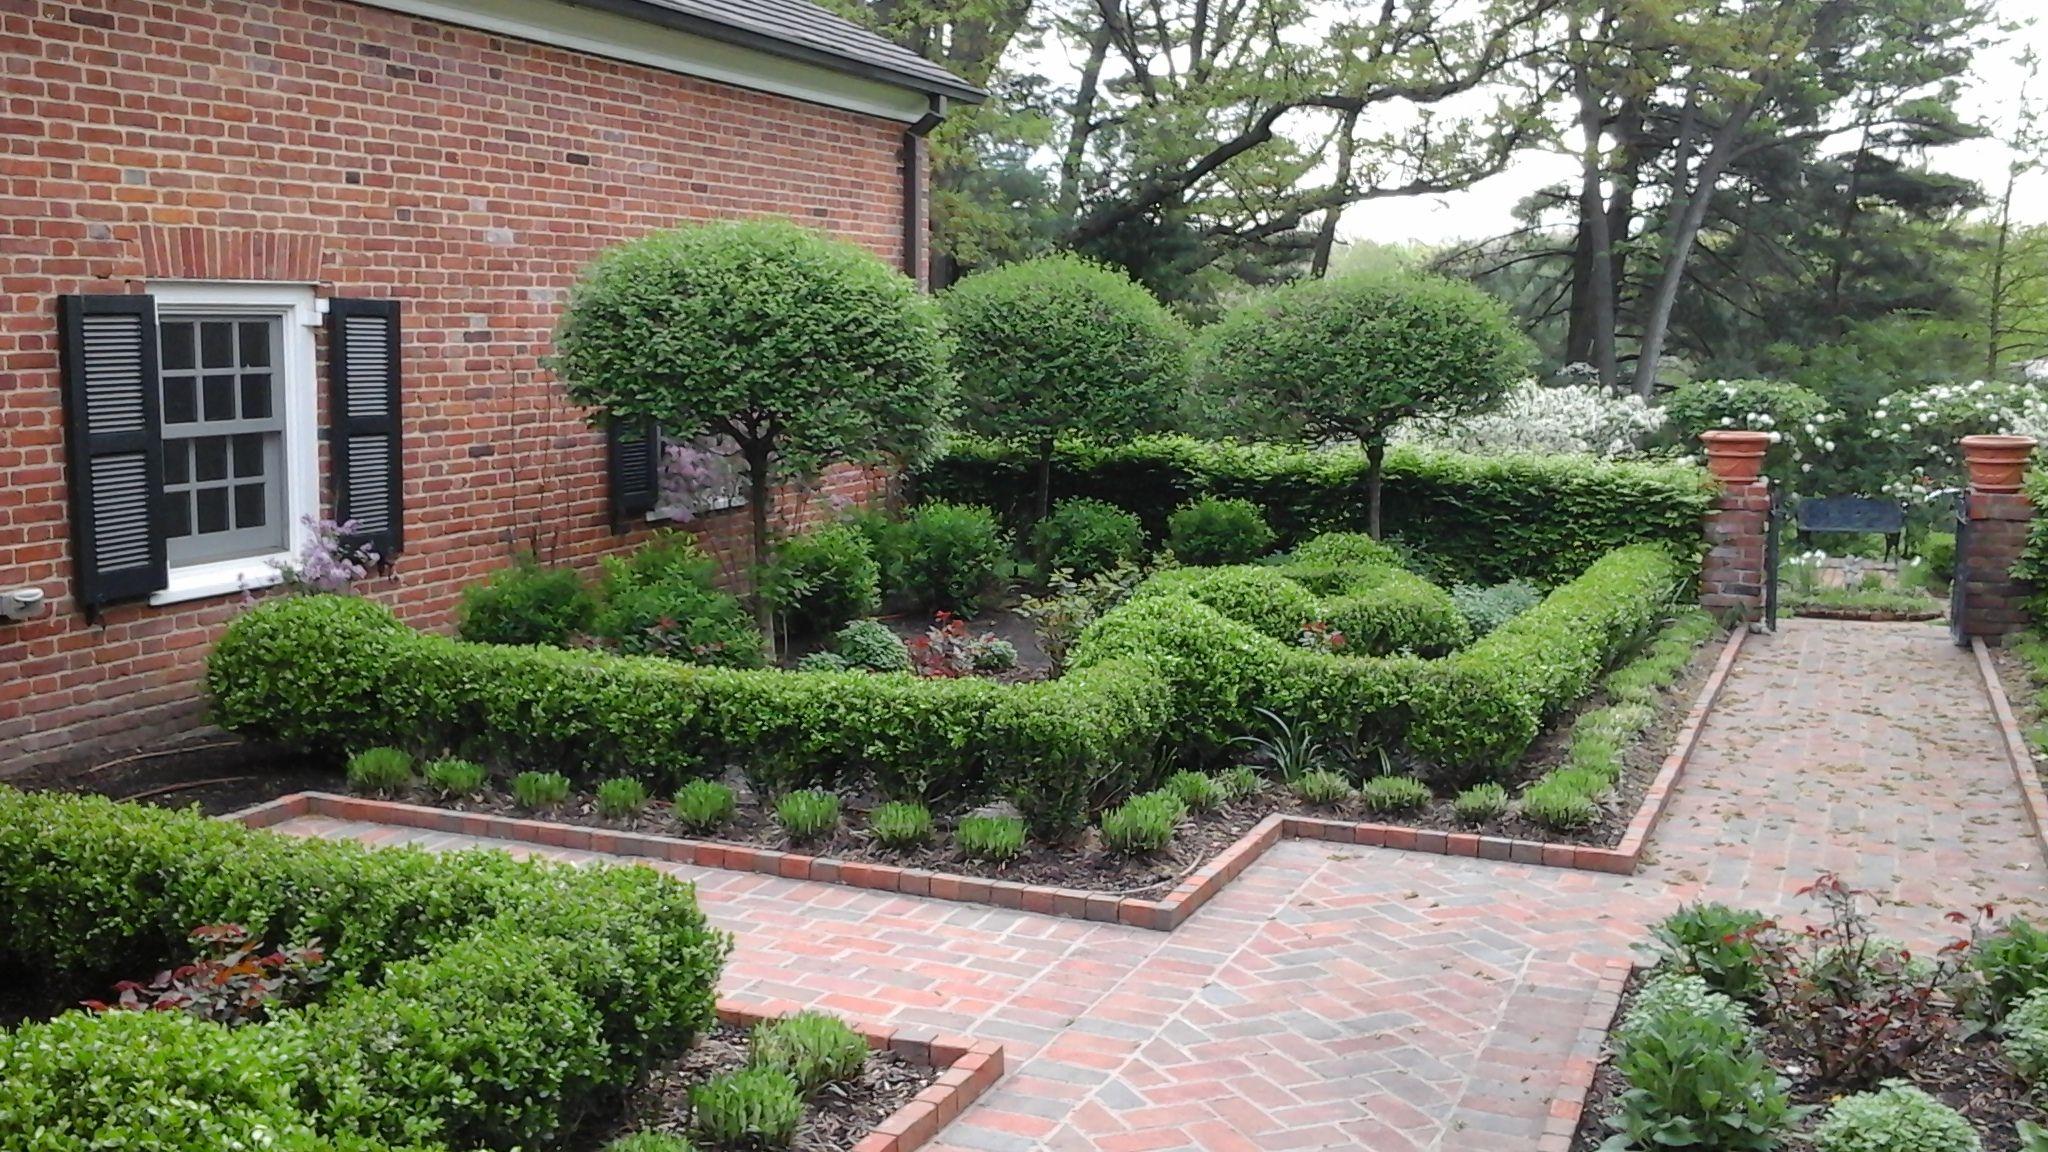 Formal English Garden Hedges Of Boxwoods And Burning Bushes